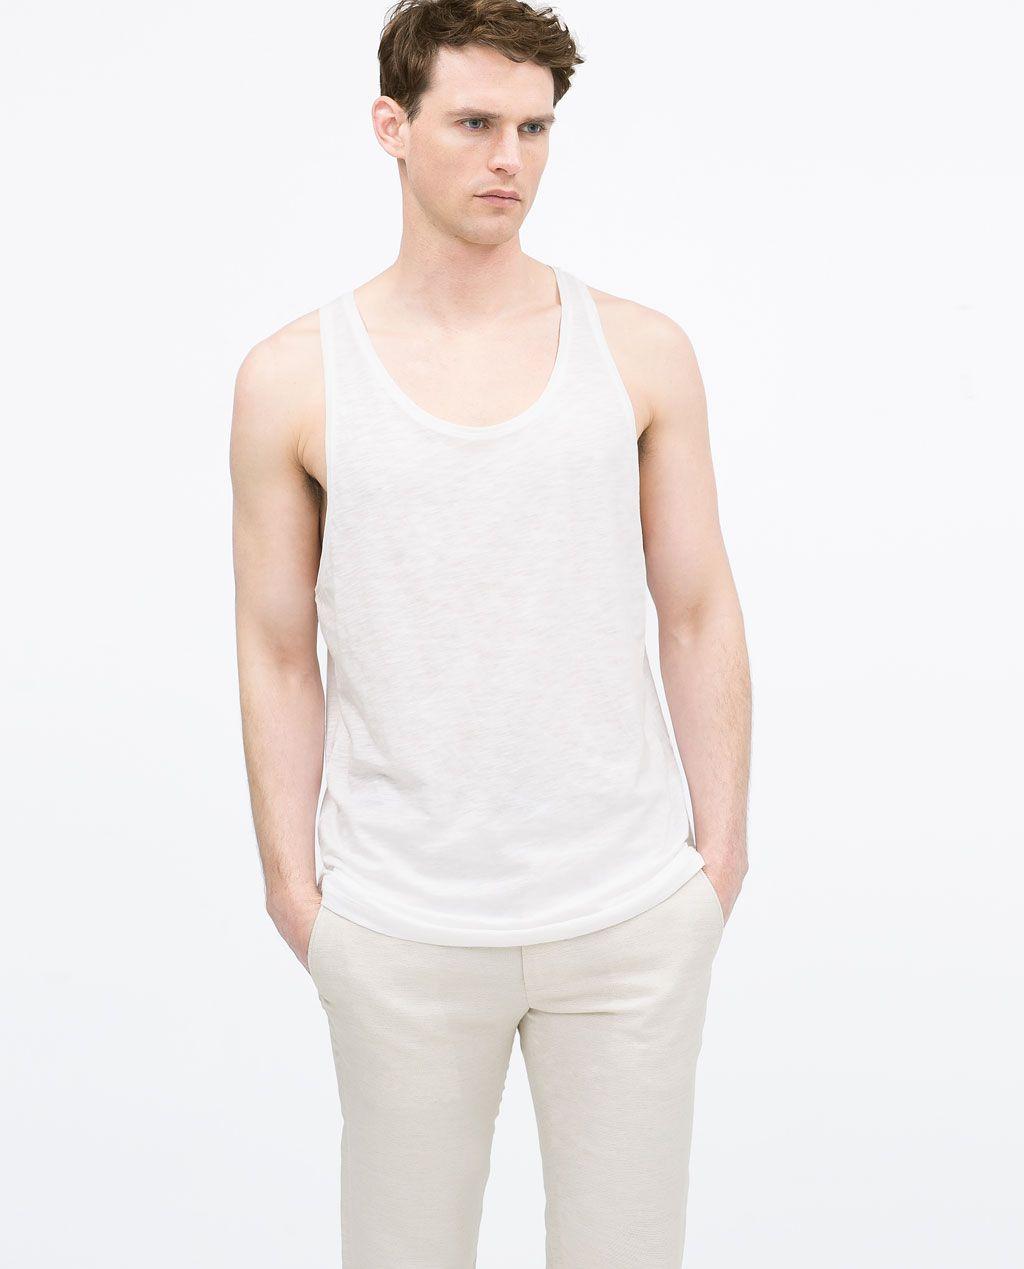 ZARA - MAN - Cotton tank-top | Zara man |